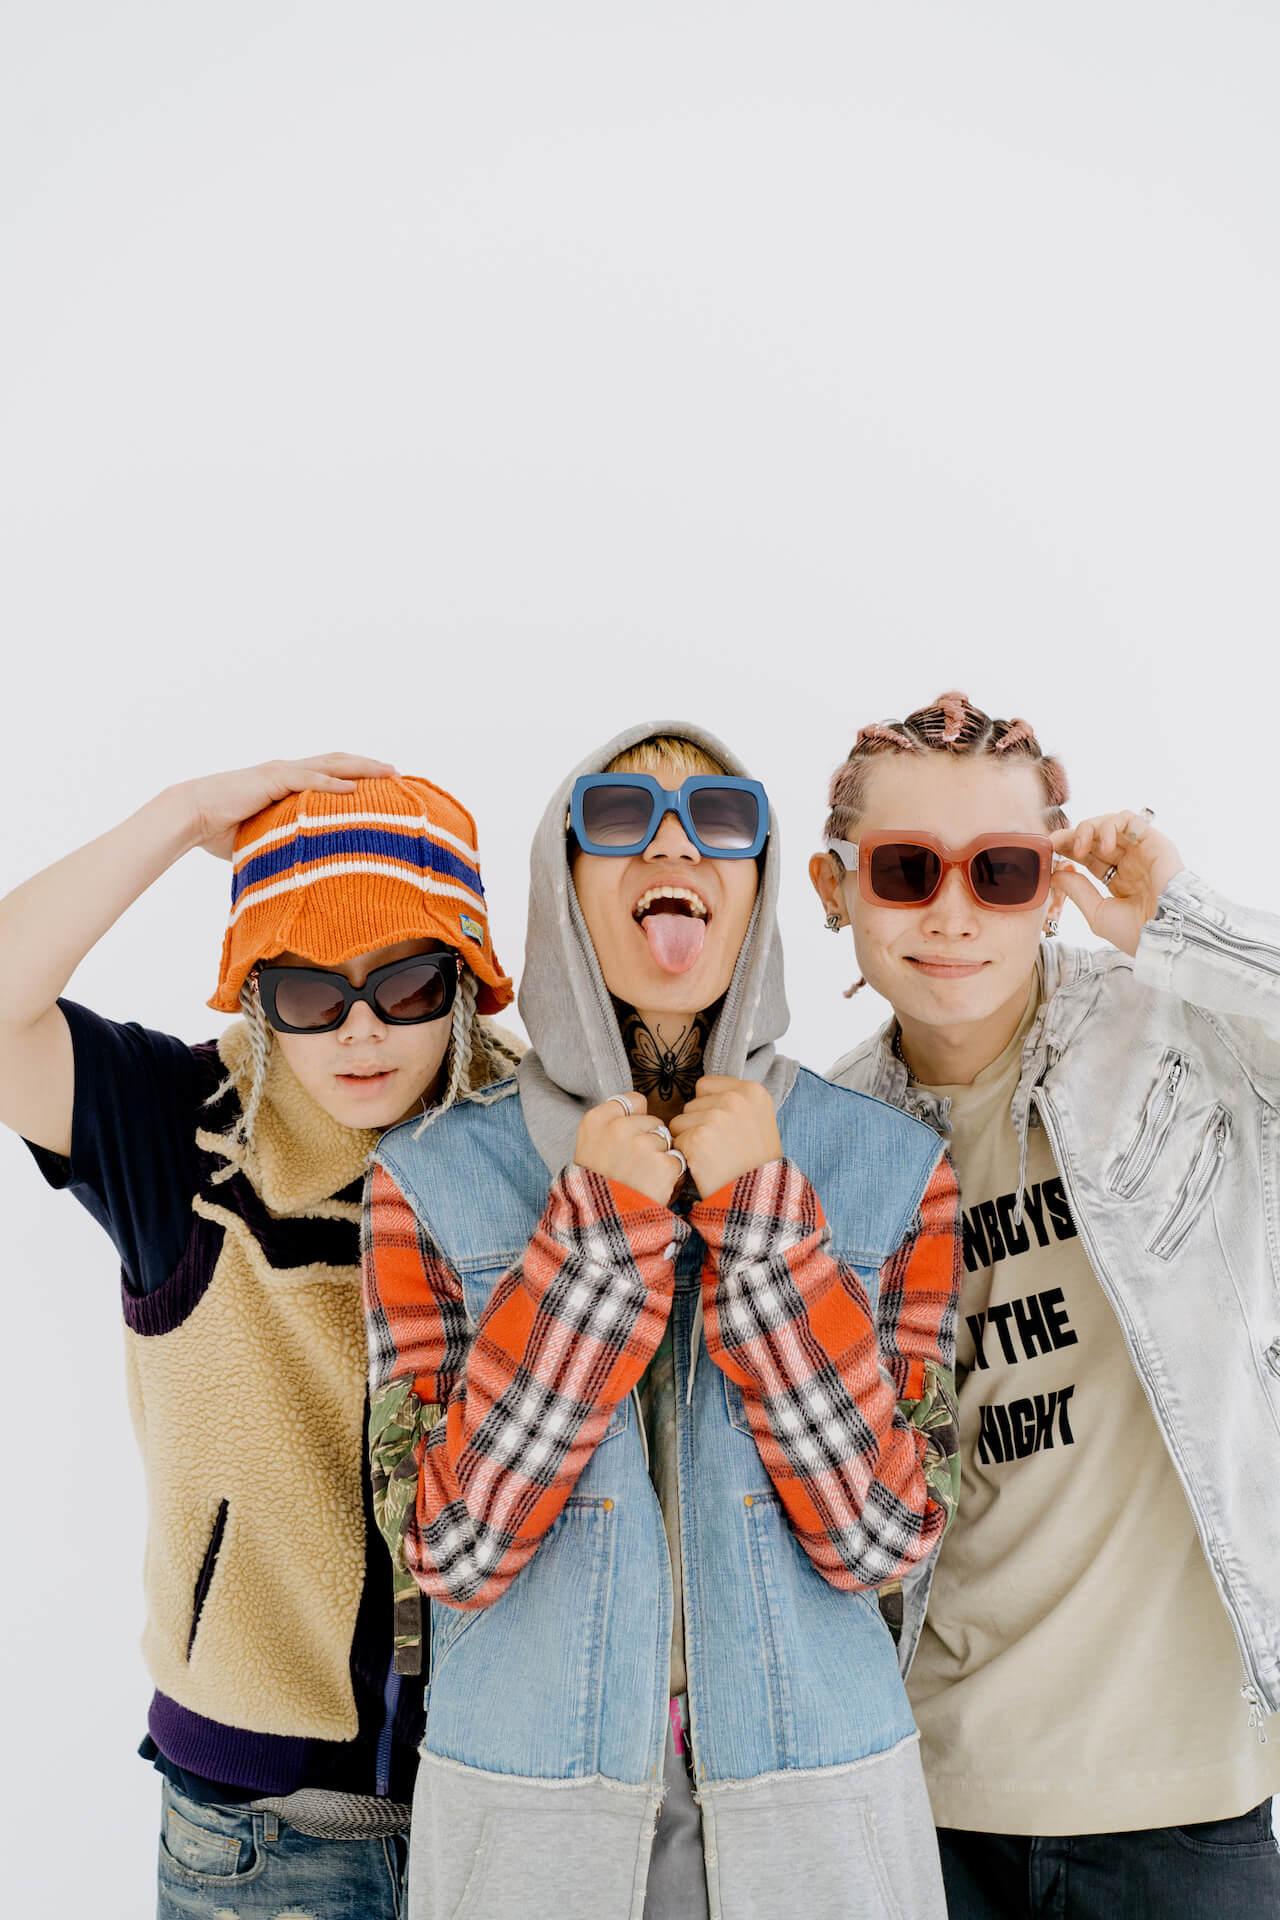 LEX、Only U、Yung sticky womのコラボアルバムからYouTubeリークで話題の「STRANGER」MVが公開 ディレクターは村田実莉 music210729-lex-onlyu-yungstickywom-2